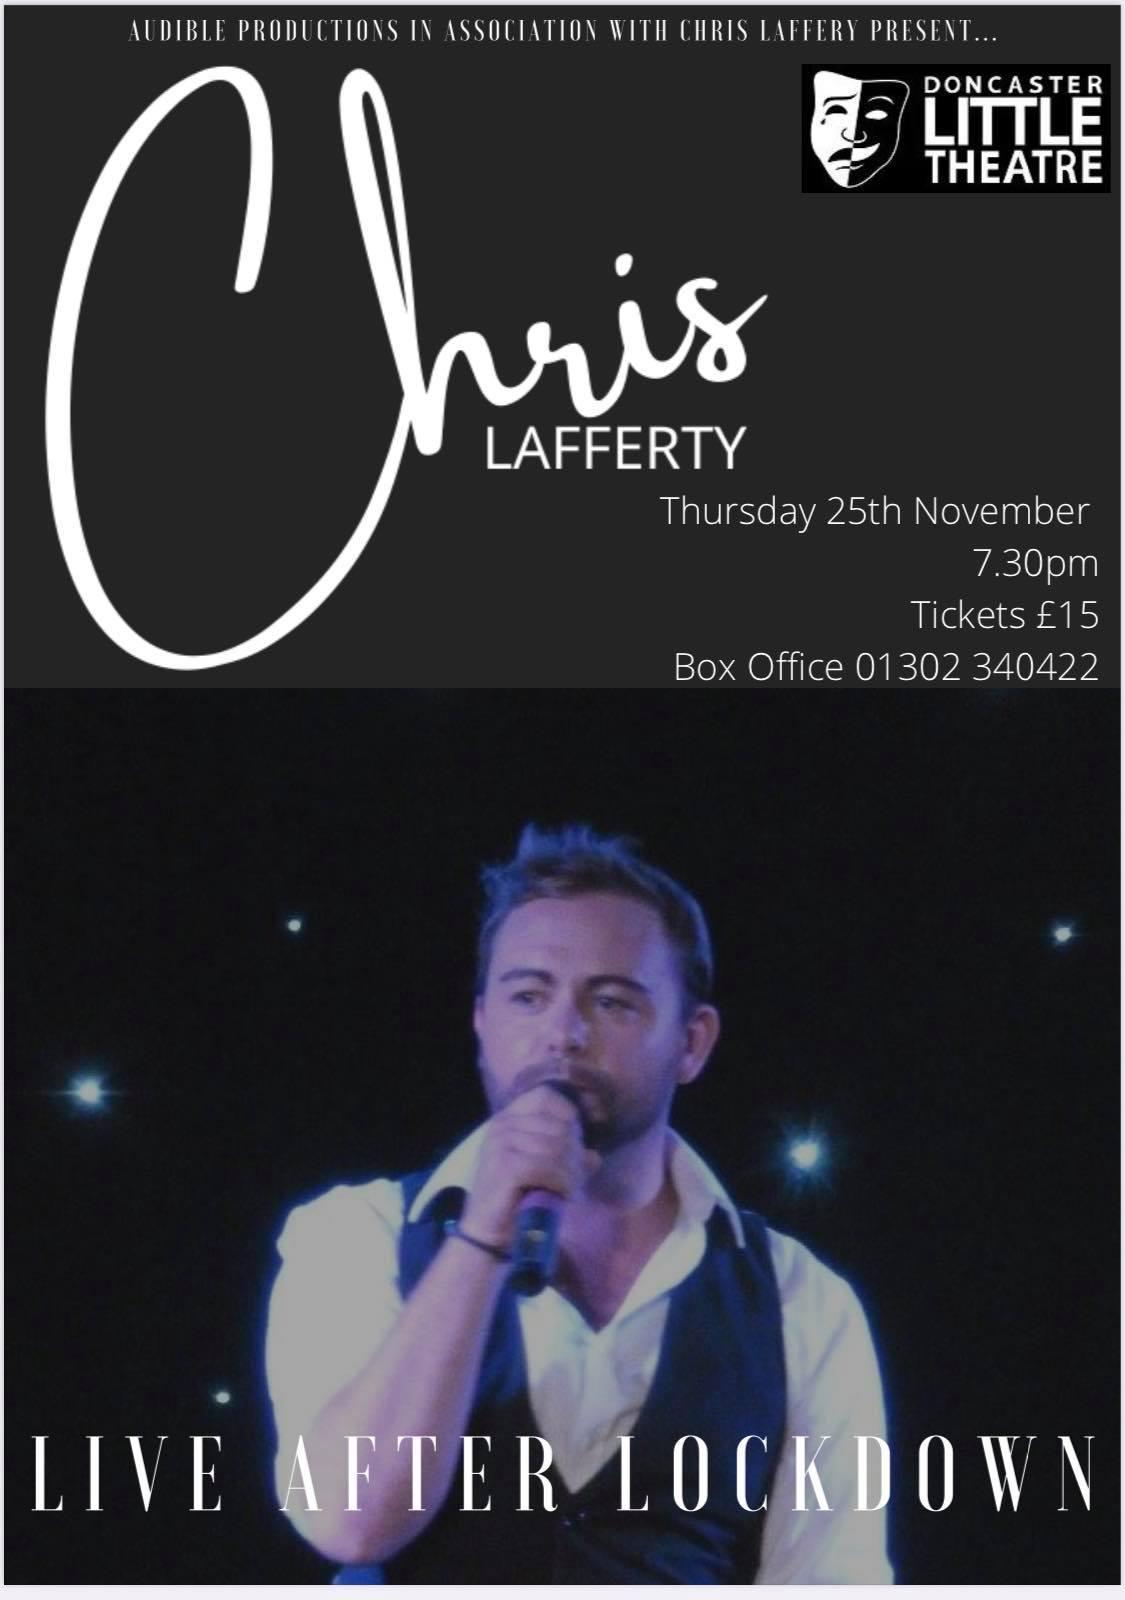 Chris Lafferty – Live after lockdown